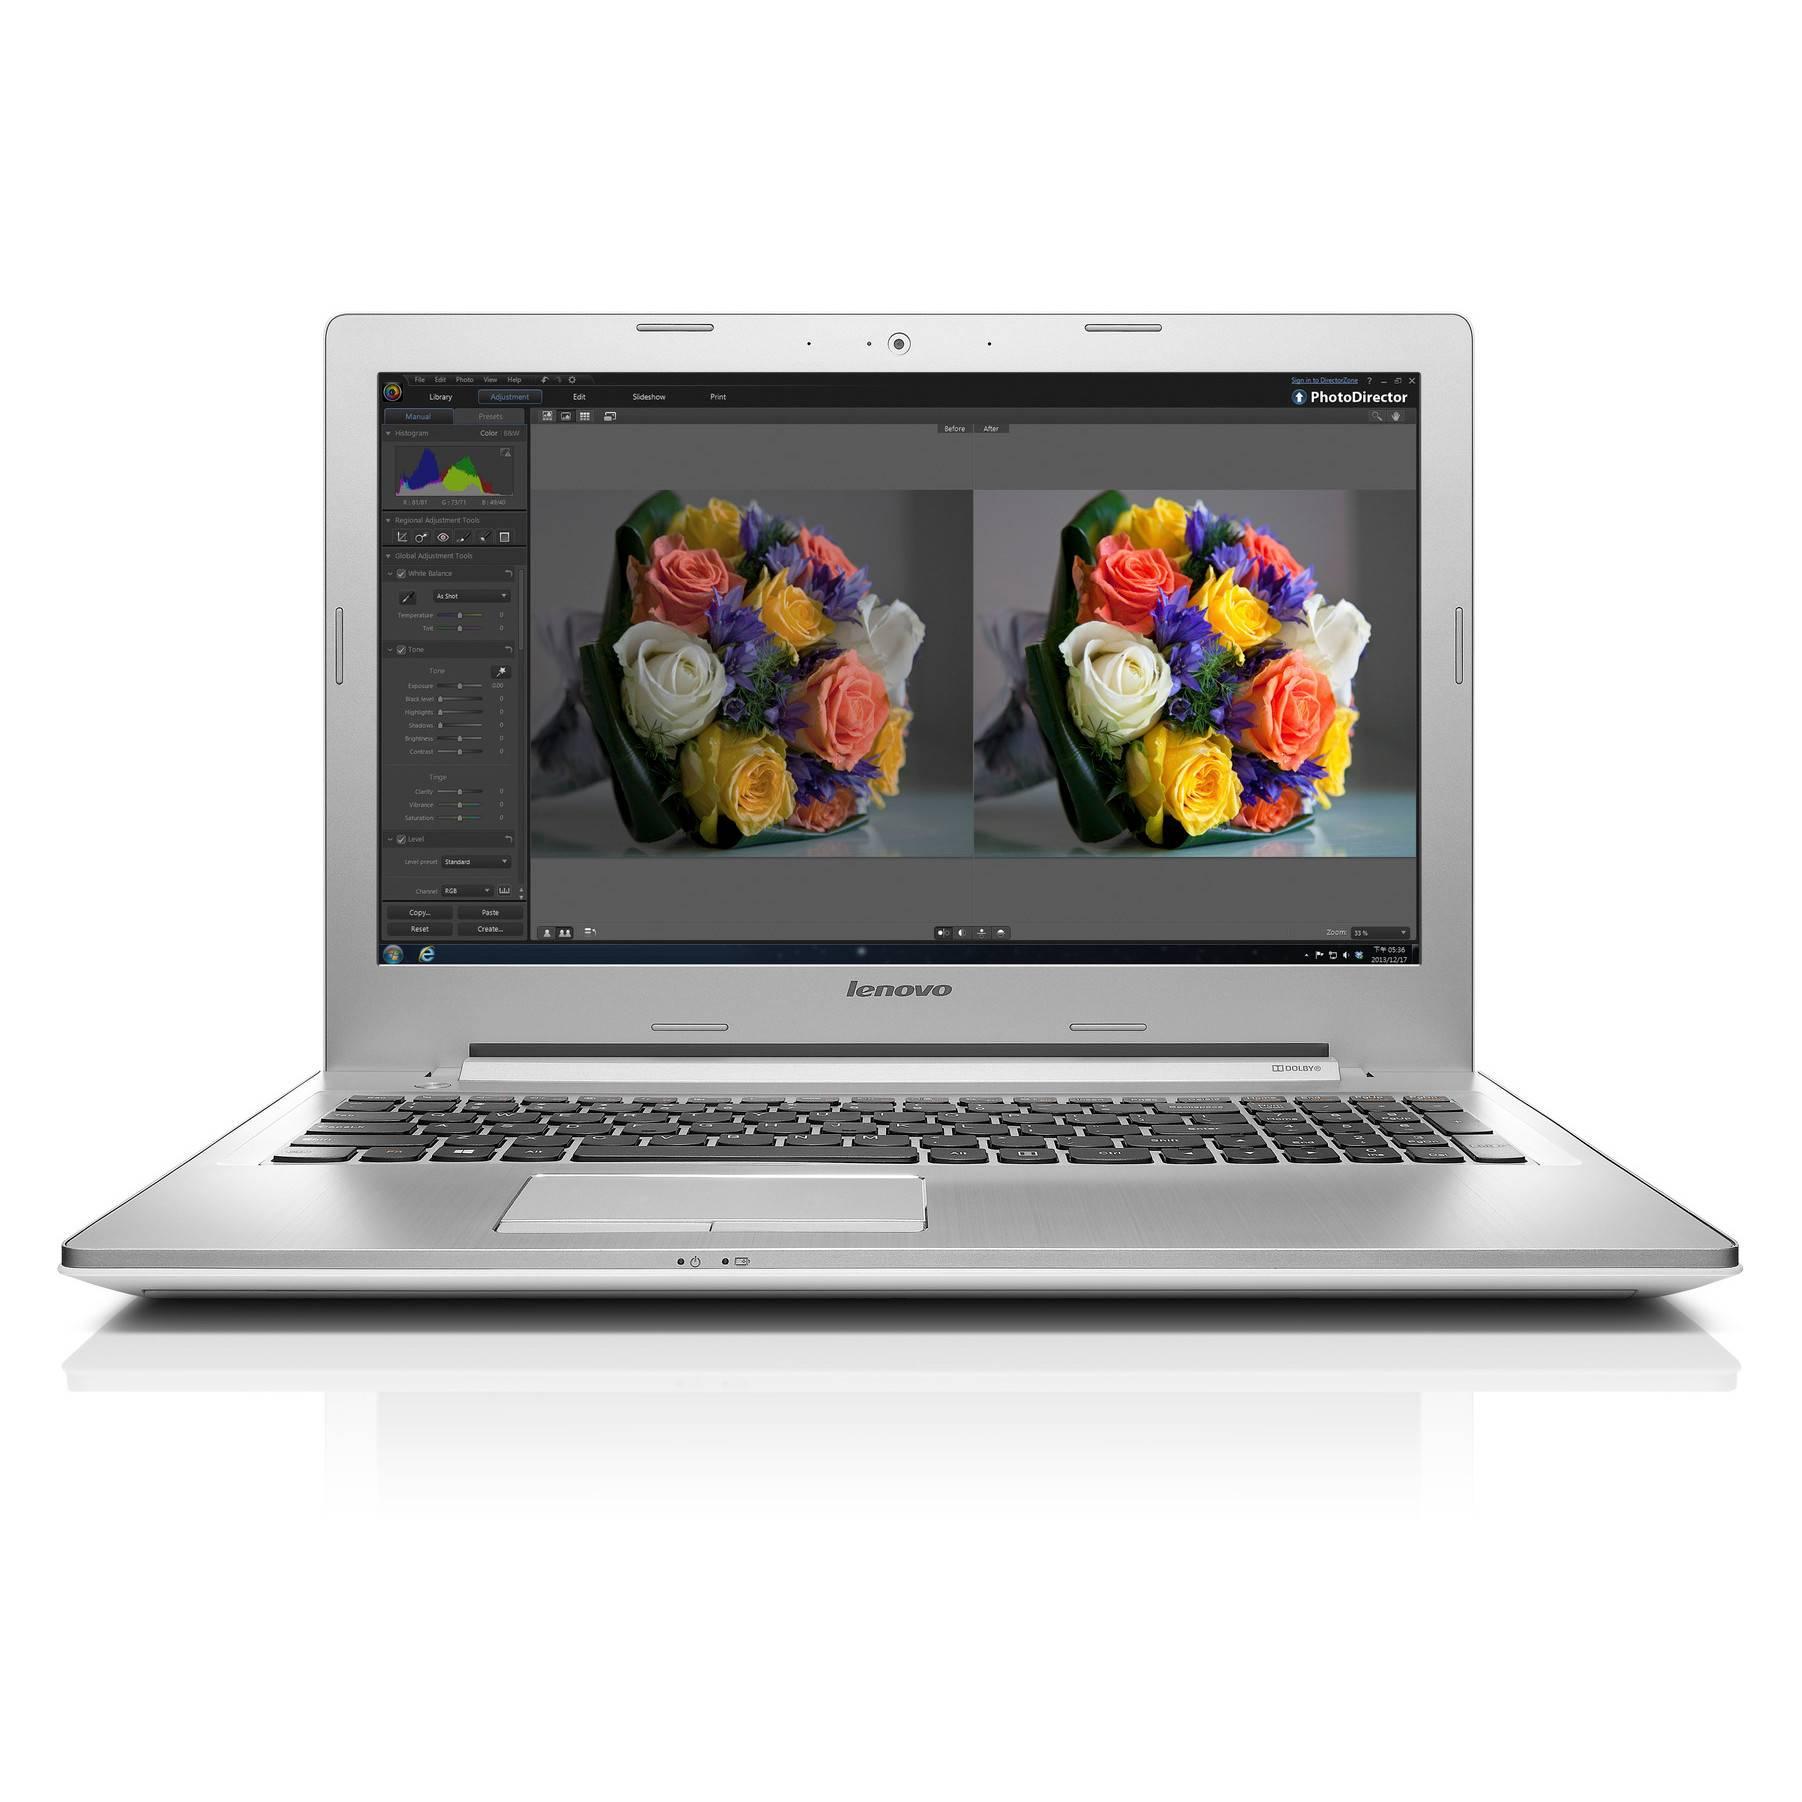 Laptop LENOVO IdeaPad Z50-70 za 2099zł @ Agito